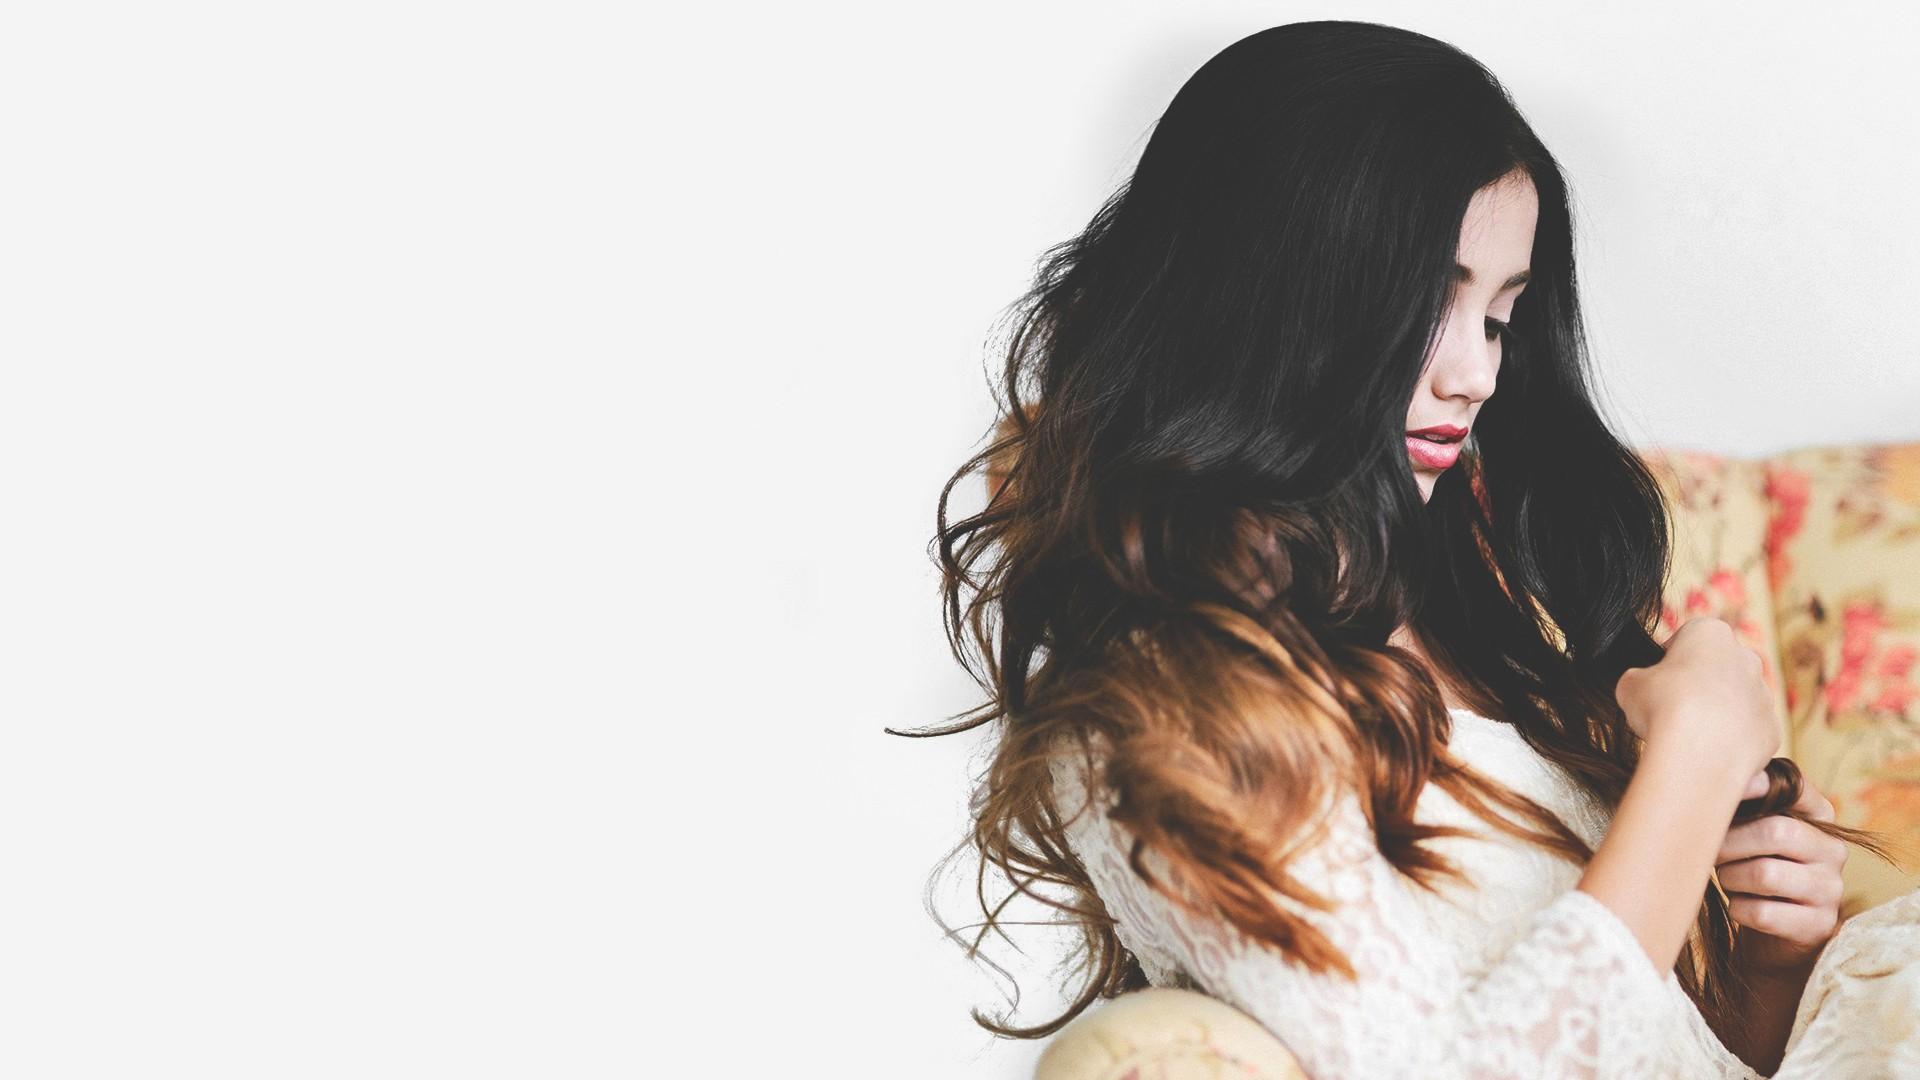 Hintergrundbilder Frau Modell Lange Haare Brünette